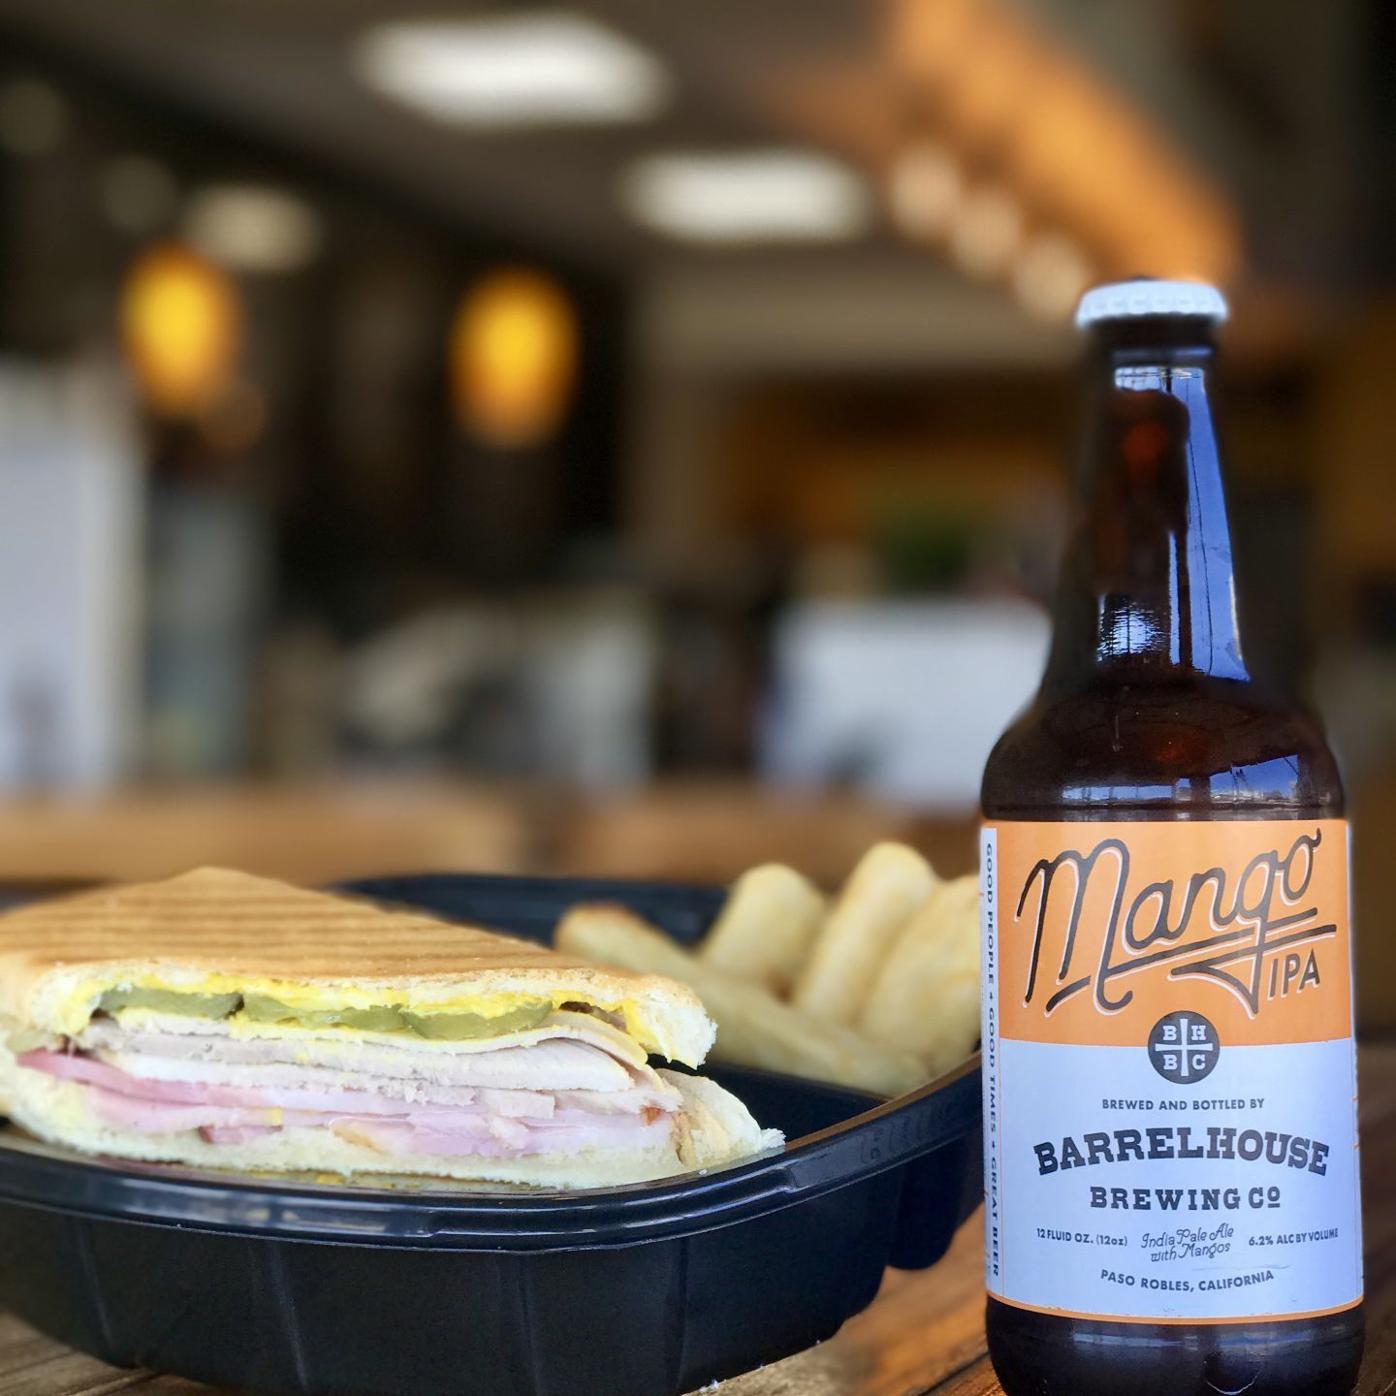 Cubano Sandwich with local Barrelhouse Brewing Mango IPA